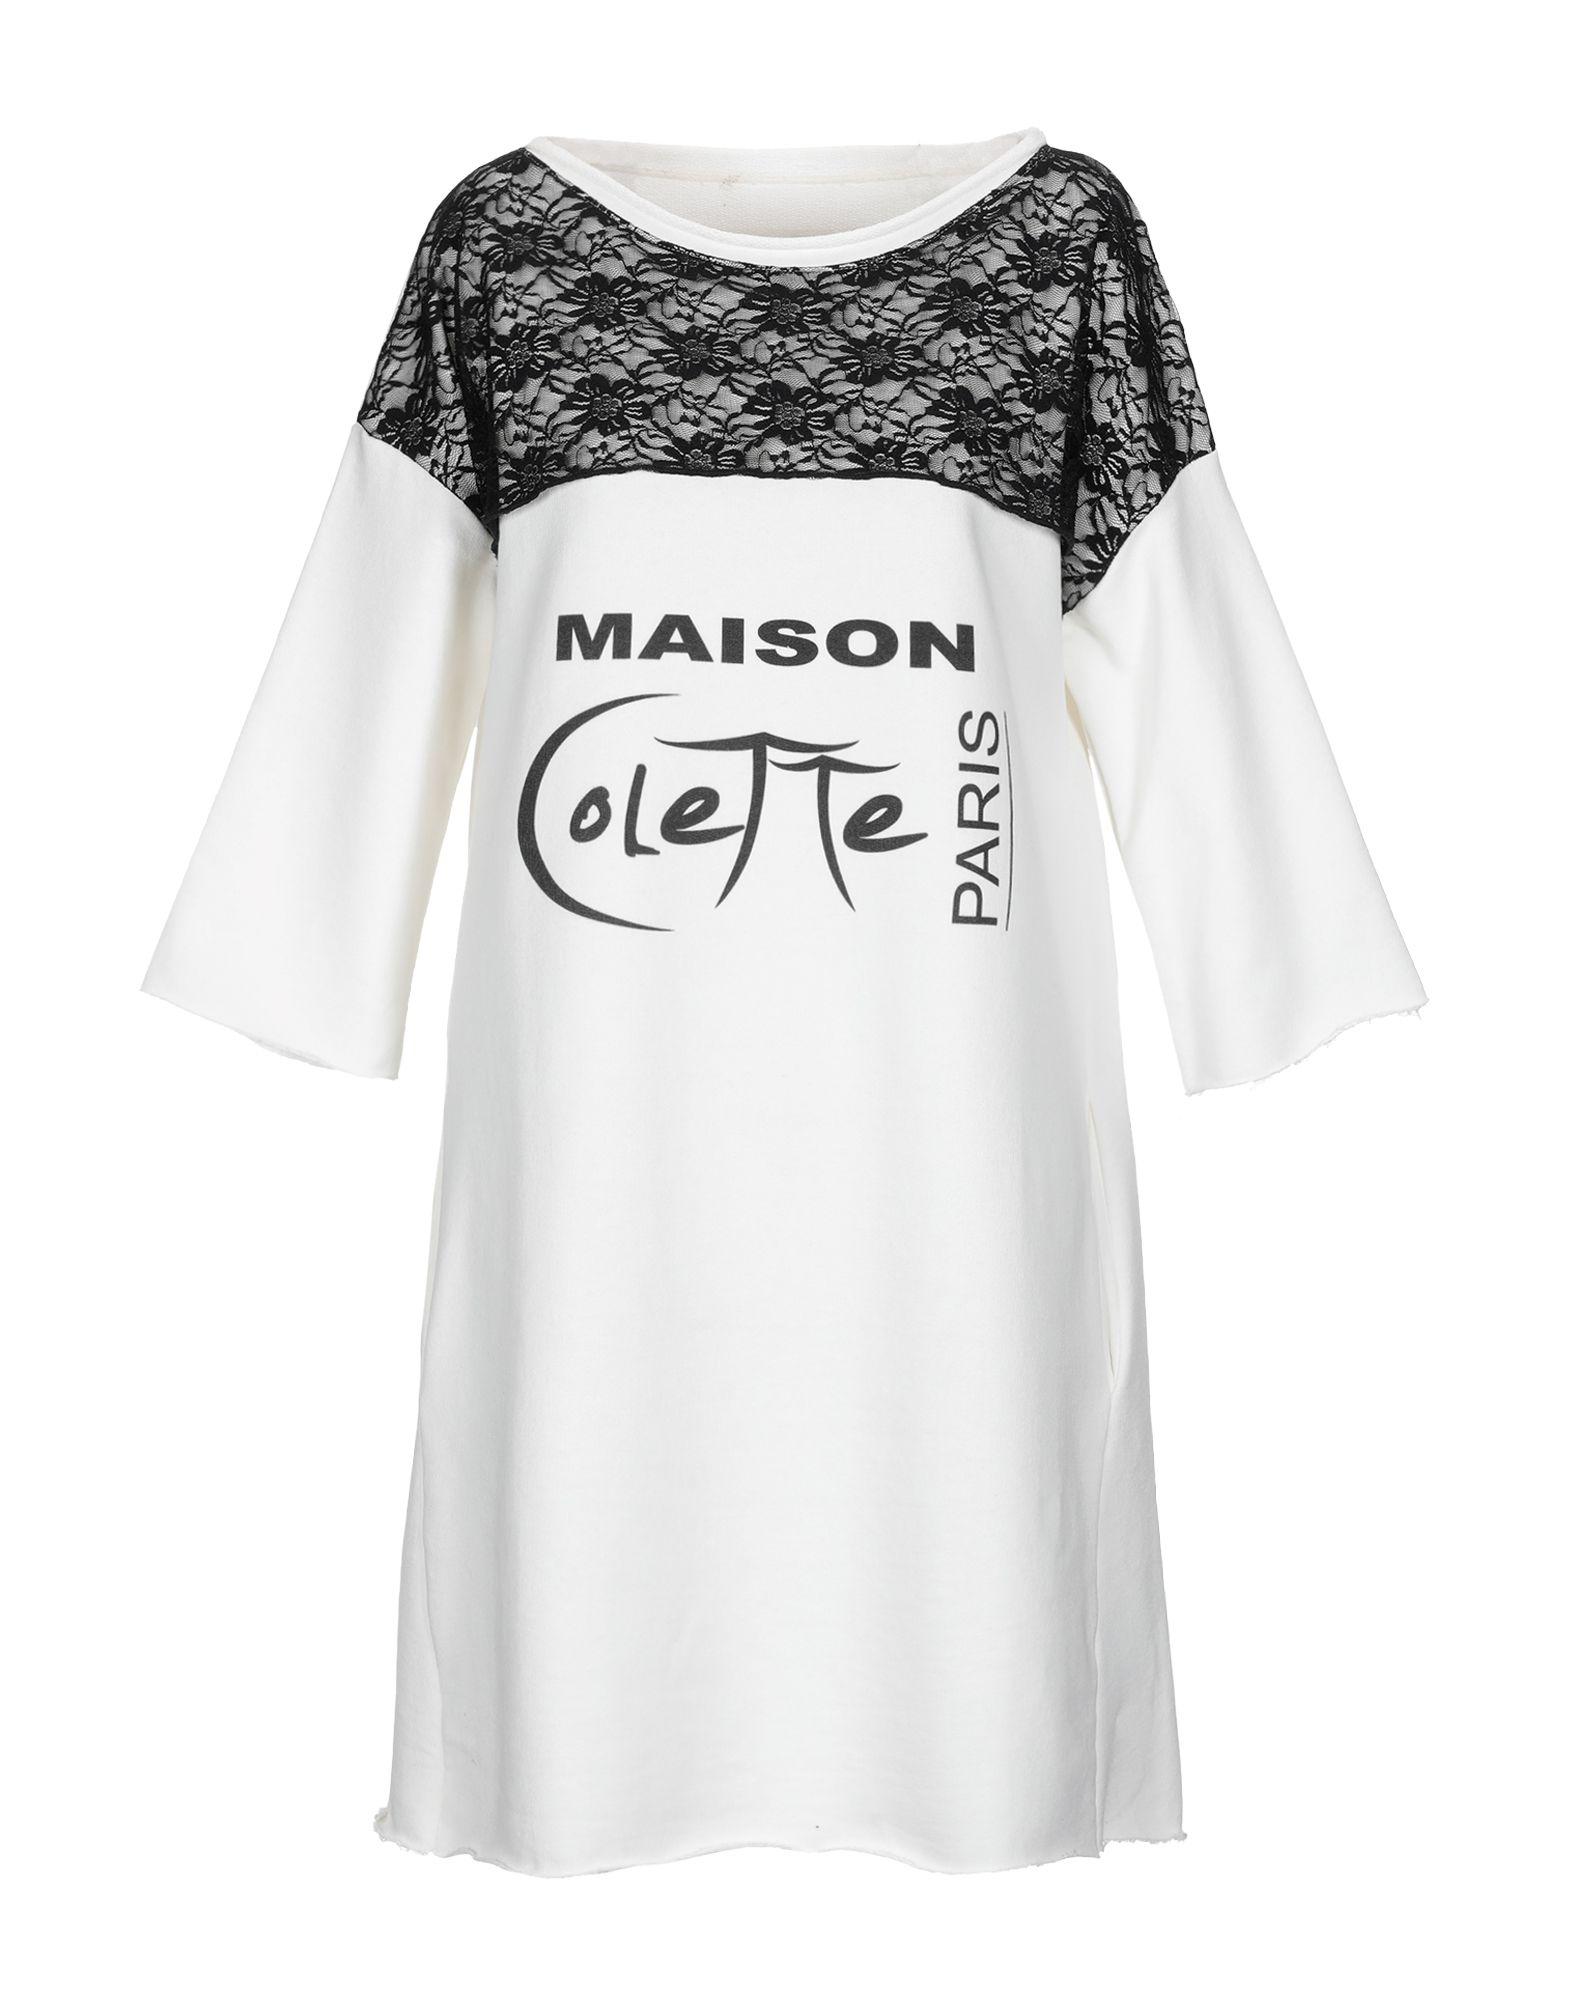 MAISON COLETTE Короткое платье цена